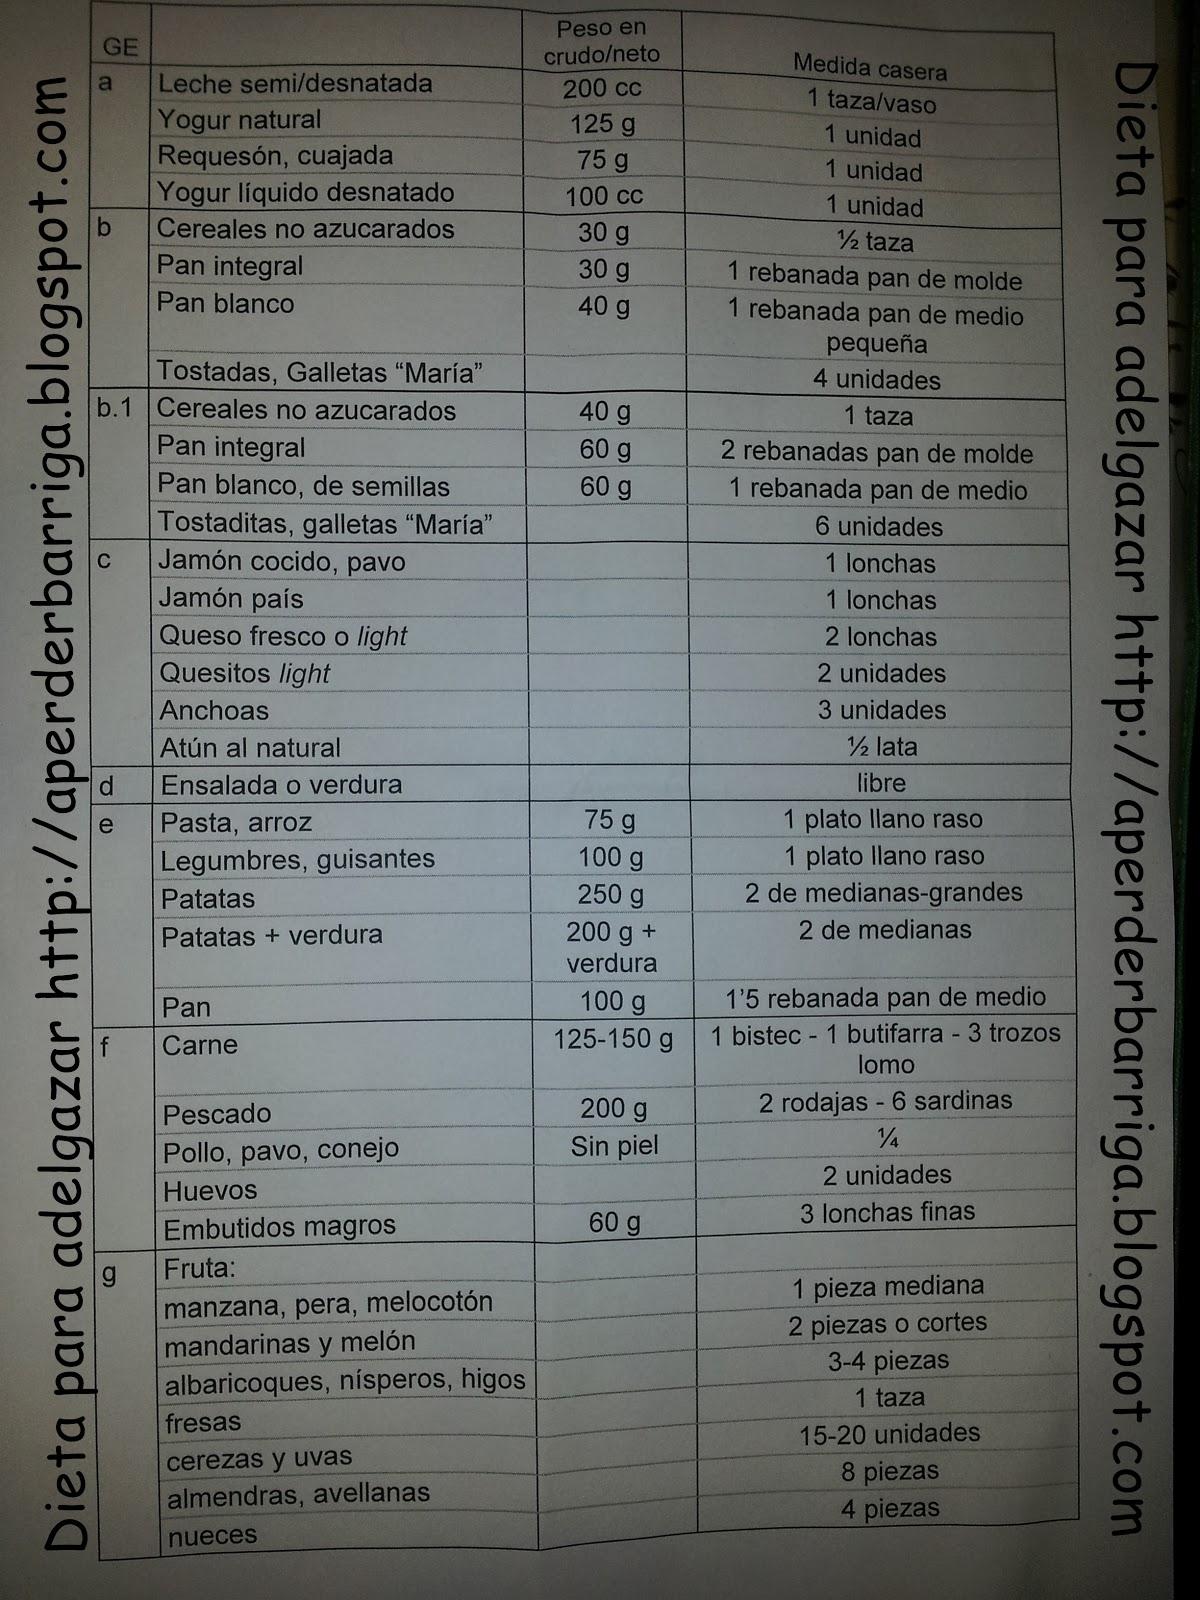 Pastillas para adelgazar neobes weight